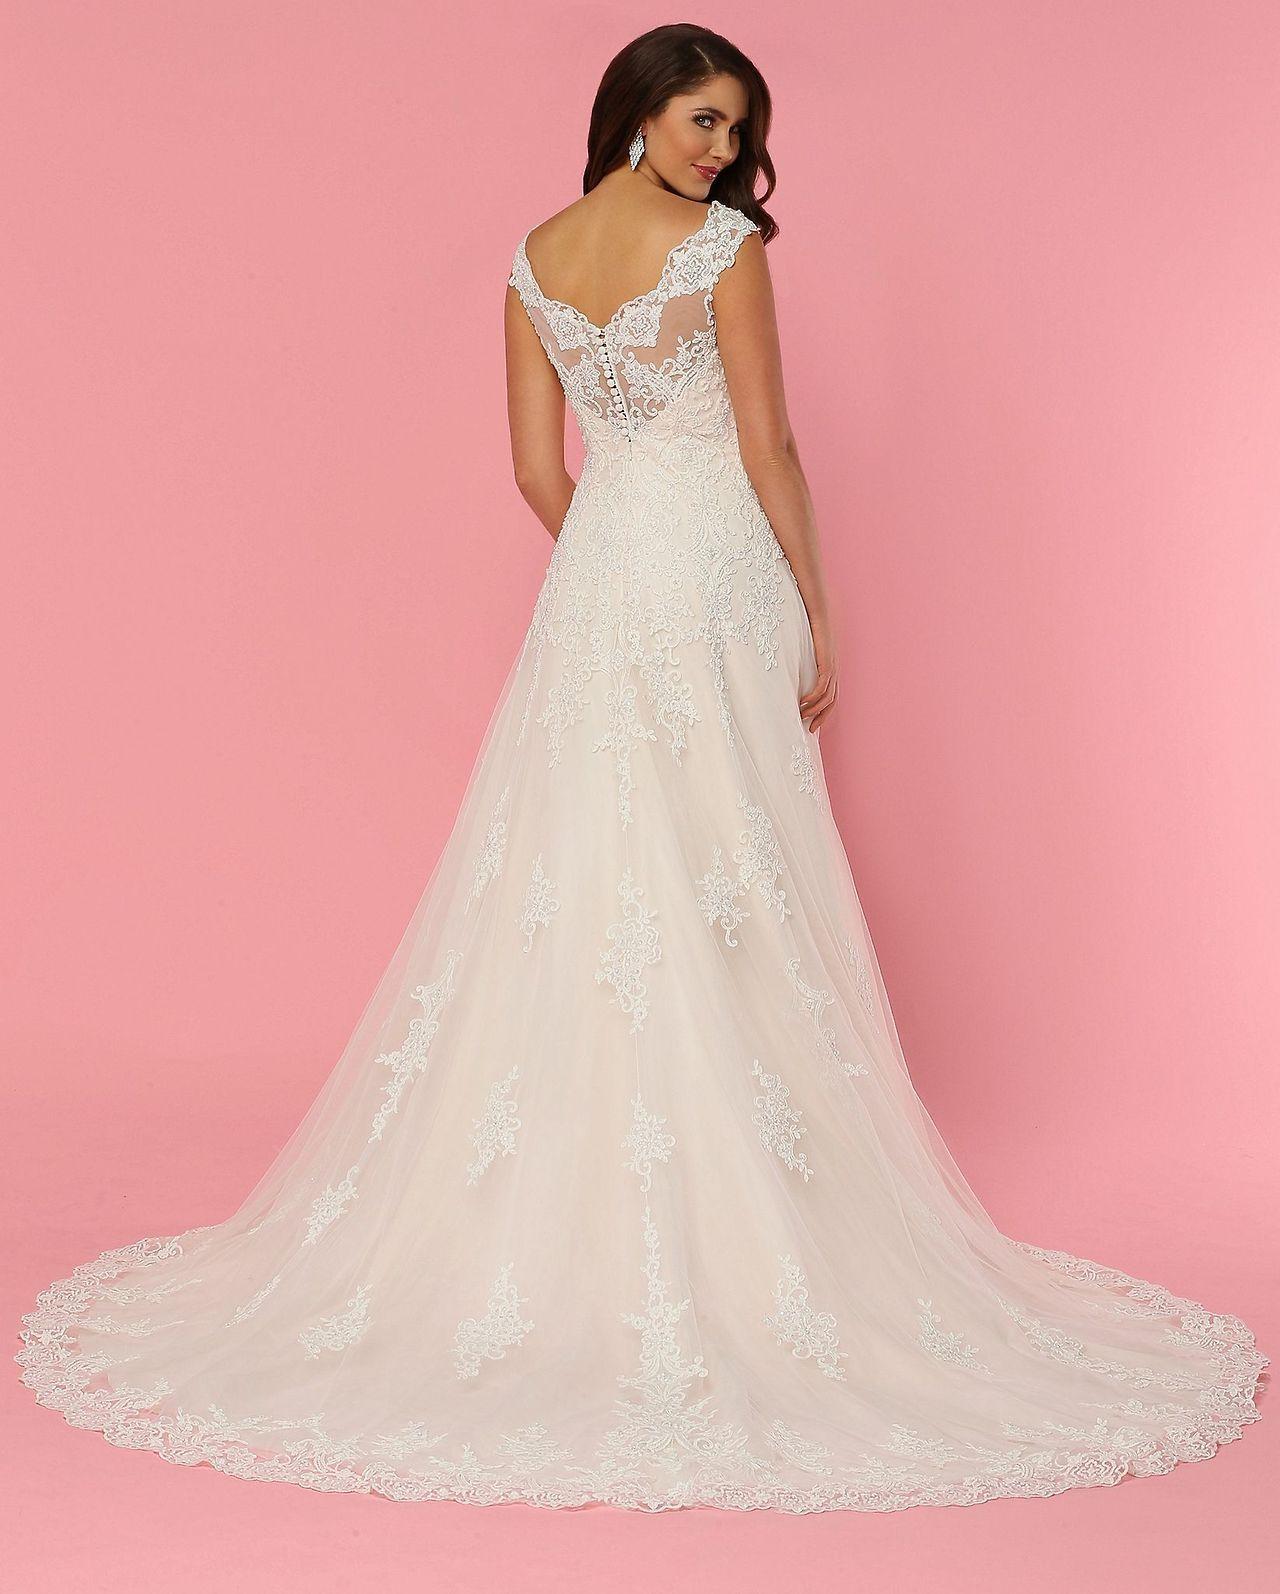 Fall in Love DaVinci Bridal\'s Style #50444 ❤   DaVinci Bridal ...